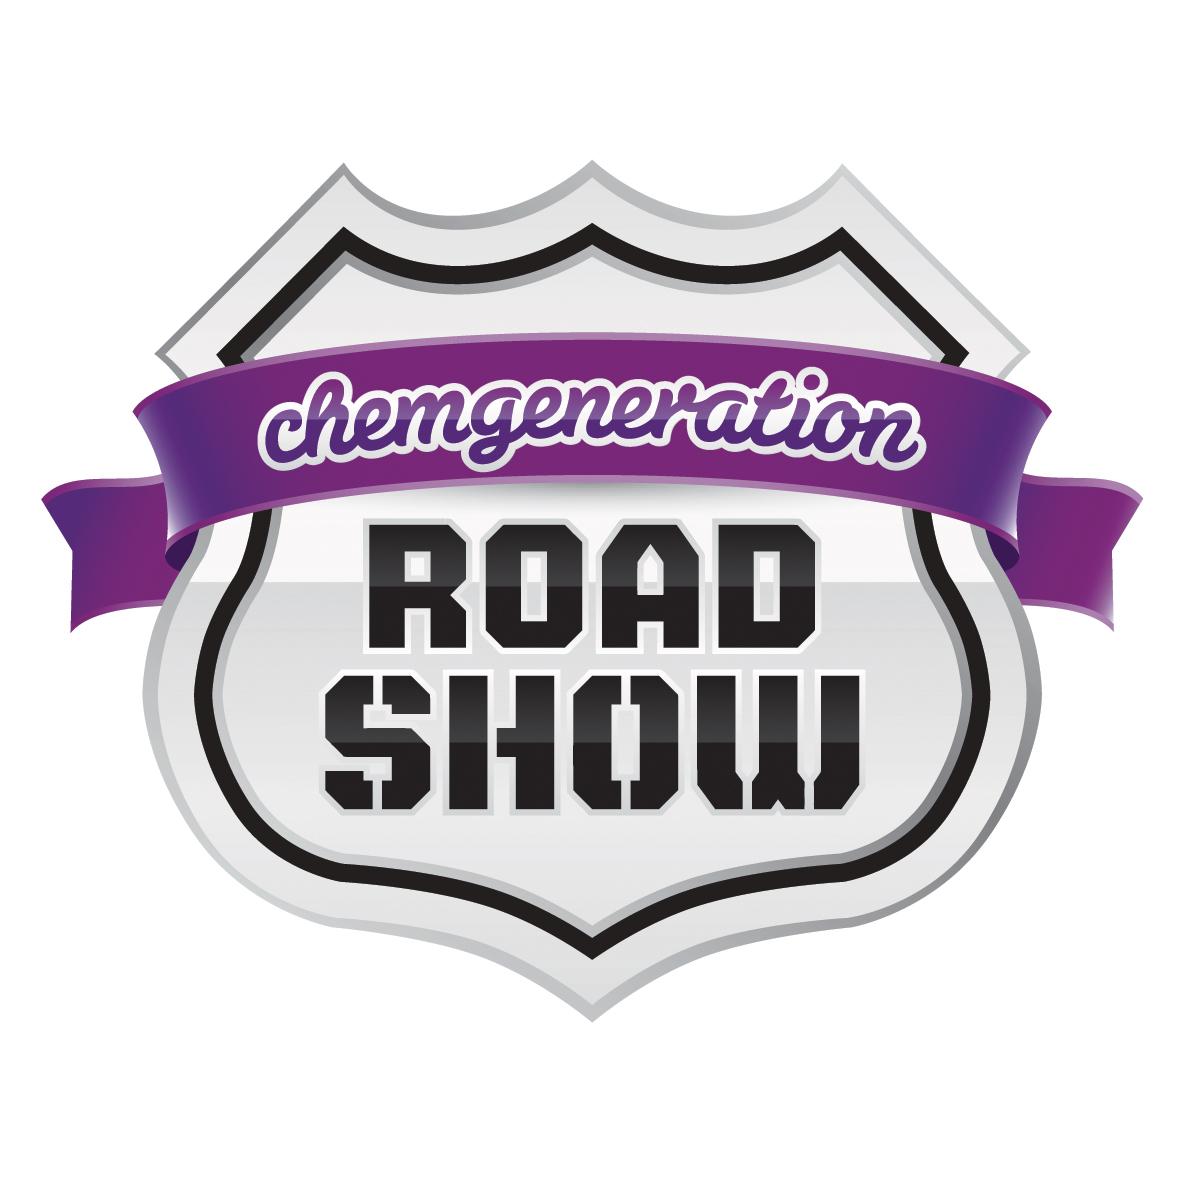 BASF-Chemgeneration Roadshow